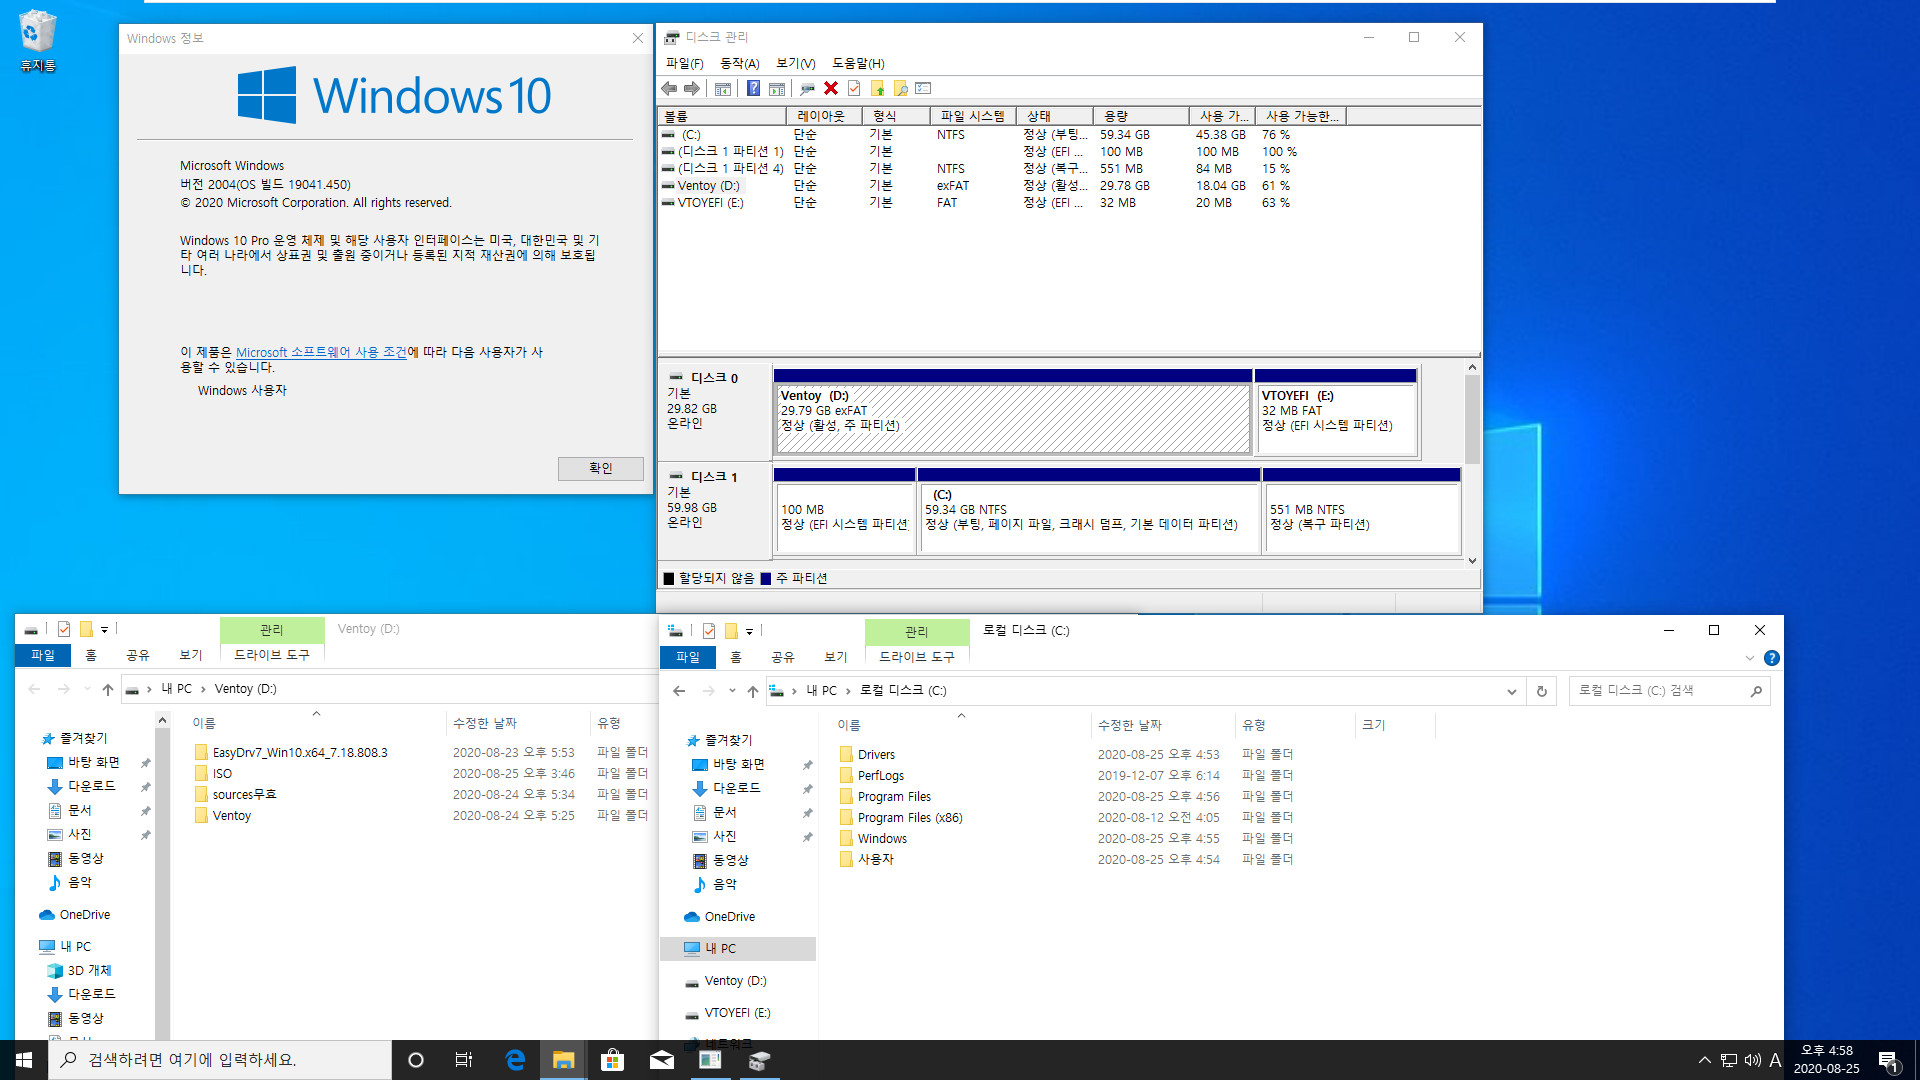 ventoy-1.0.19 으로 usb 멀티 부팅 테스트 - v2004 뼈대 2탄 테스트 - ISO로 다시 테스트 2020-08-25_165834.jpg